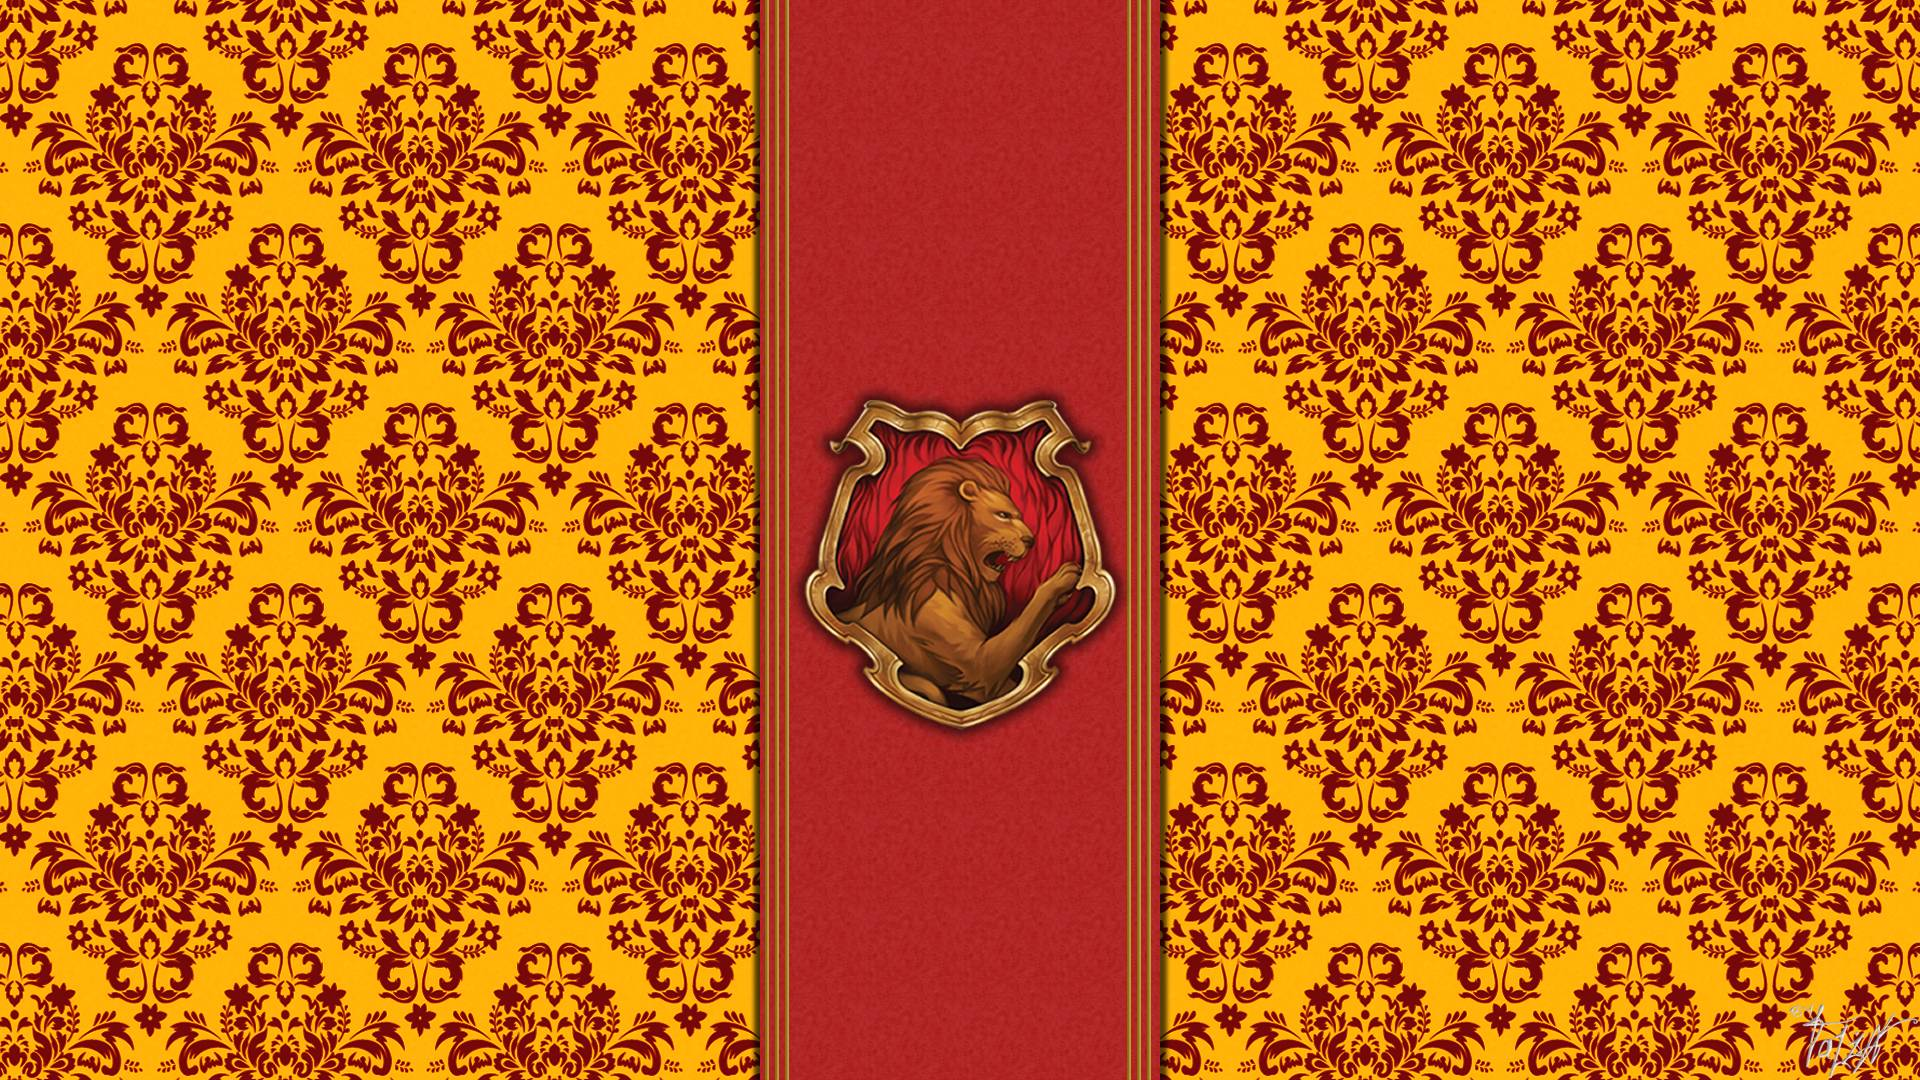 Hogwarts Castle Wallpapers Desktop Castle Great Hall - Harry Potter Themed Background - HD Wallpaper